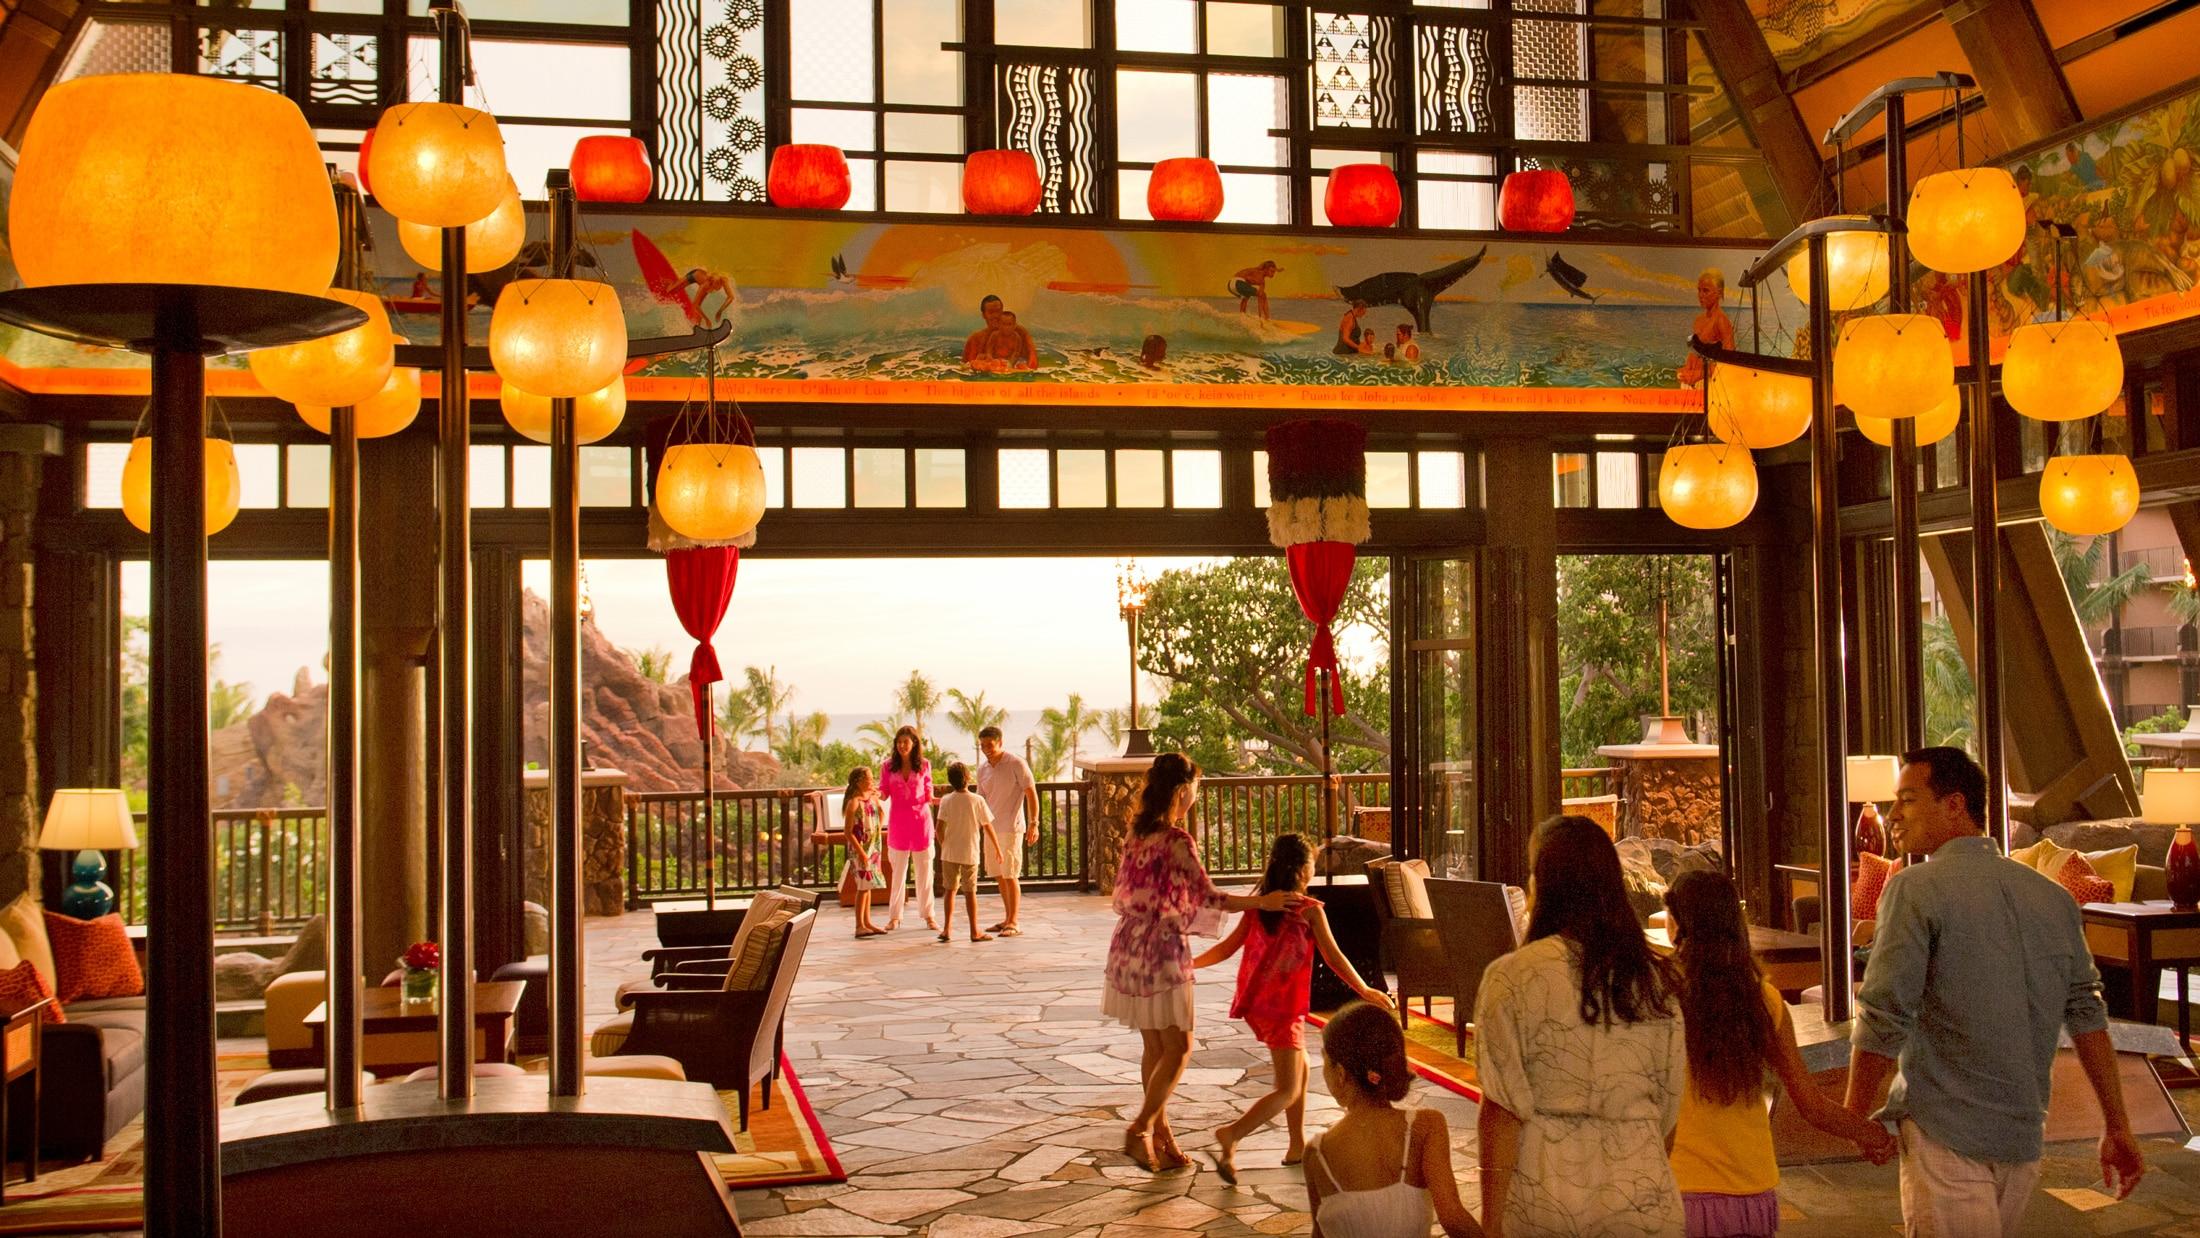 Guests walking through the lobby at Aulani Resort